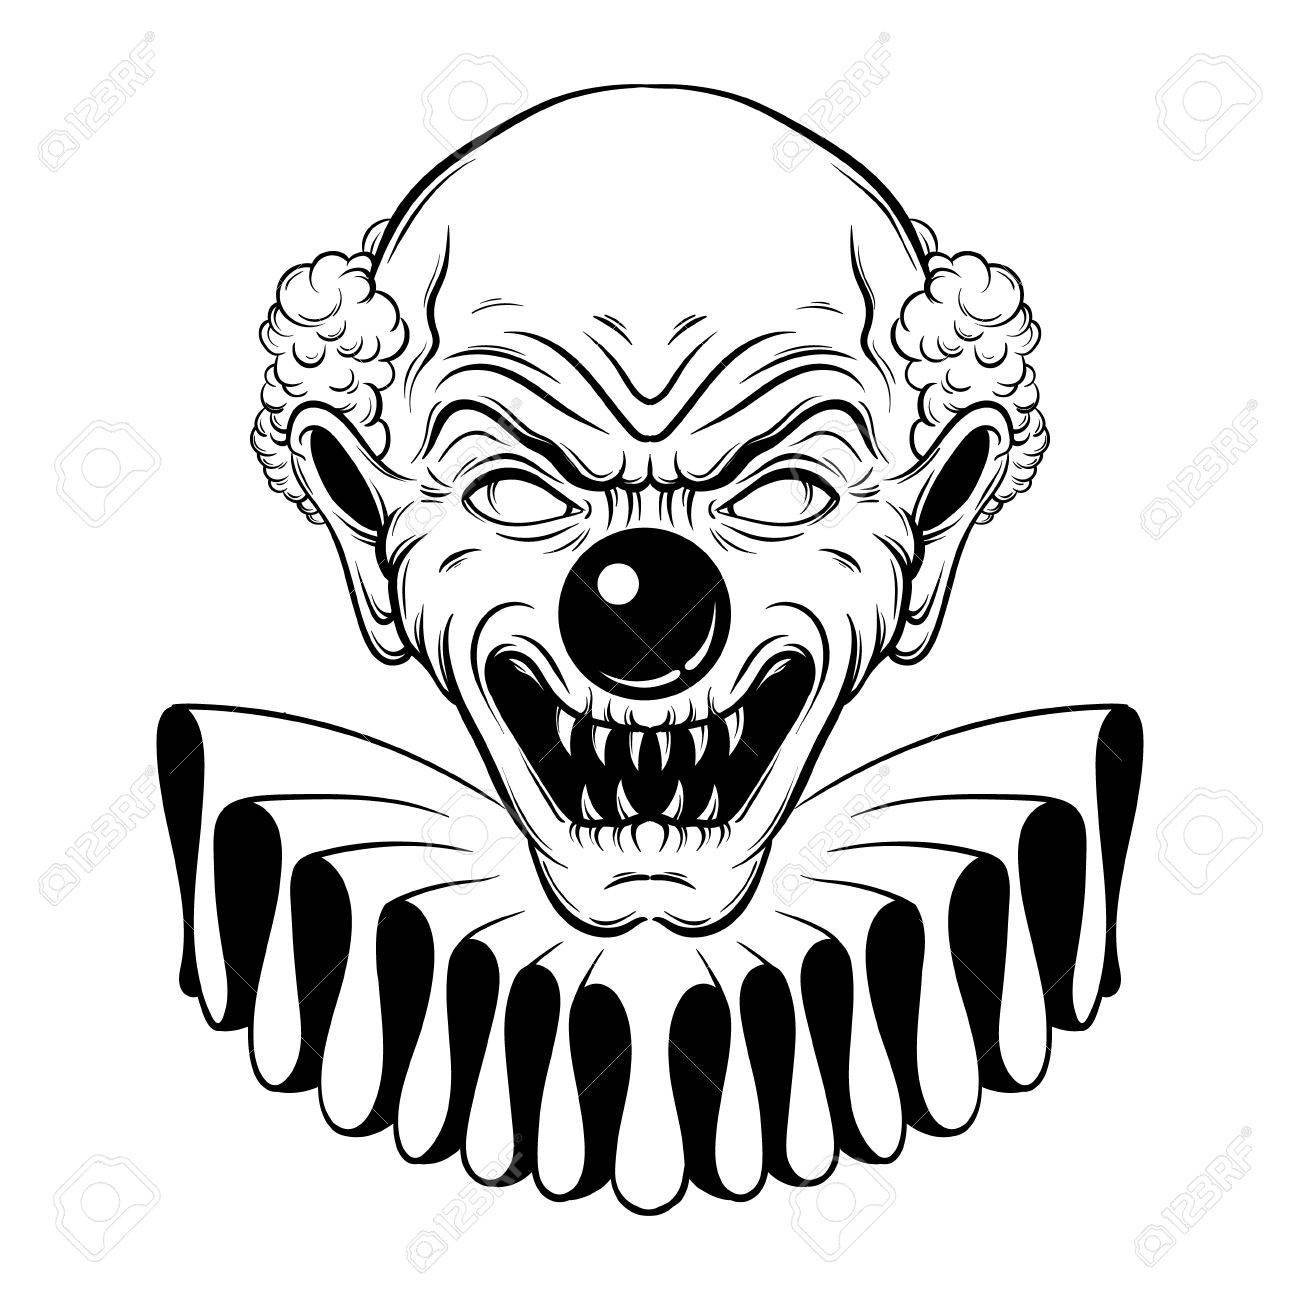 Vector Illustration Dessinee A La Main De Clown En Colere